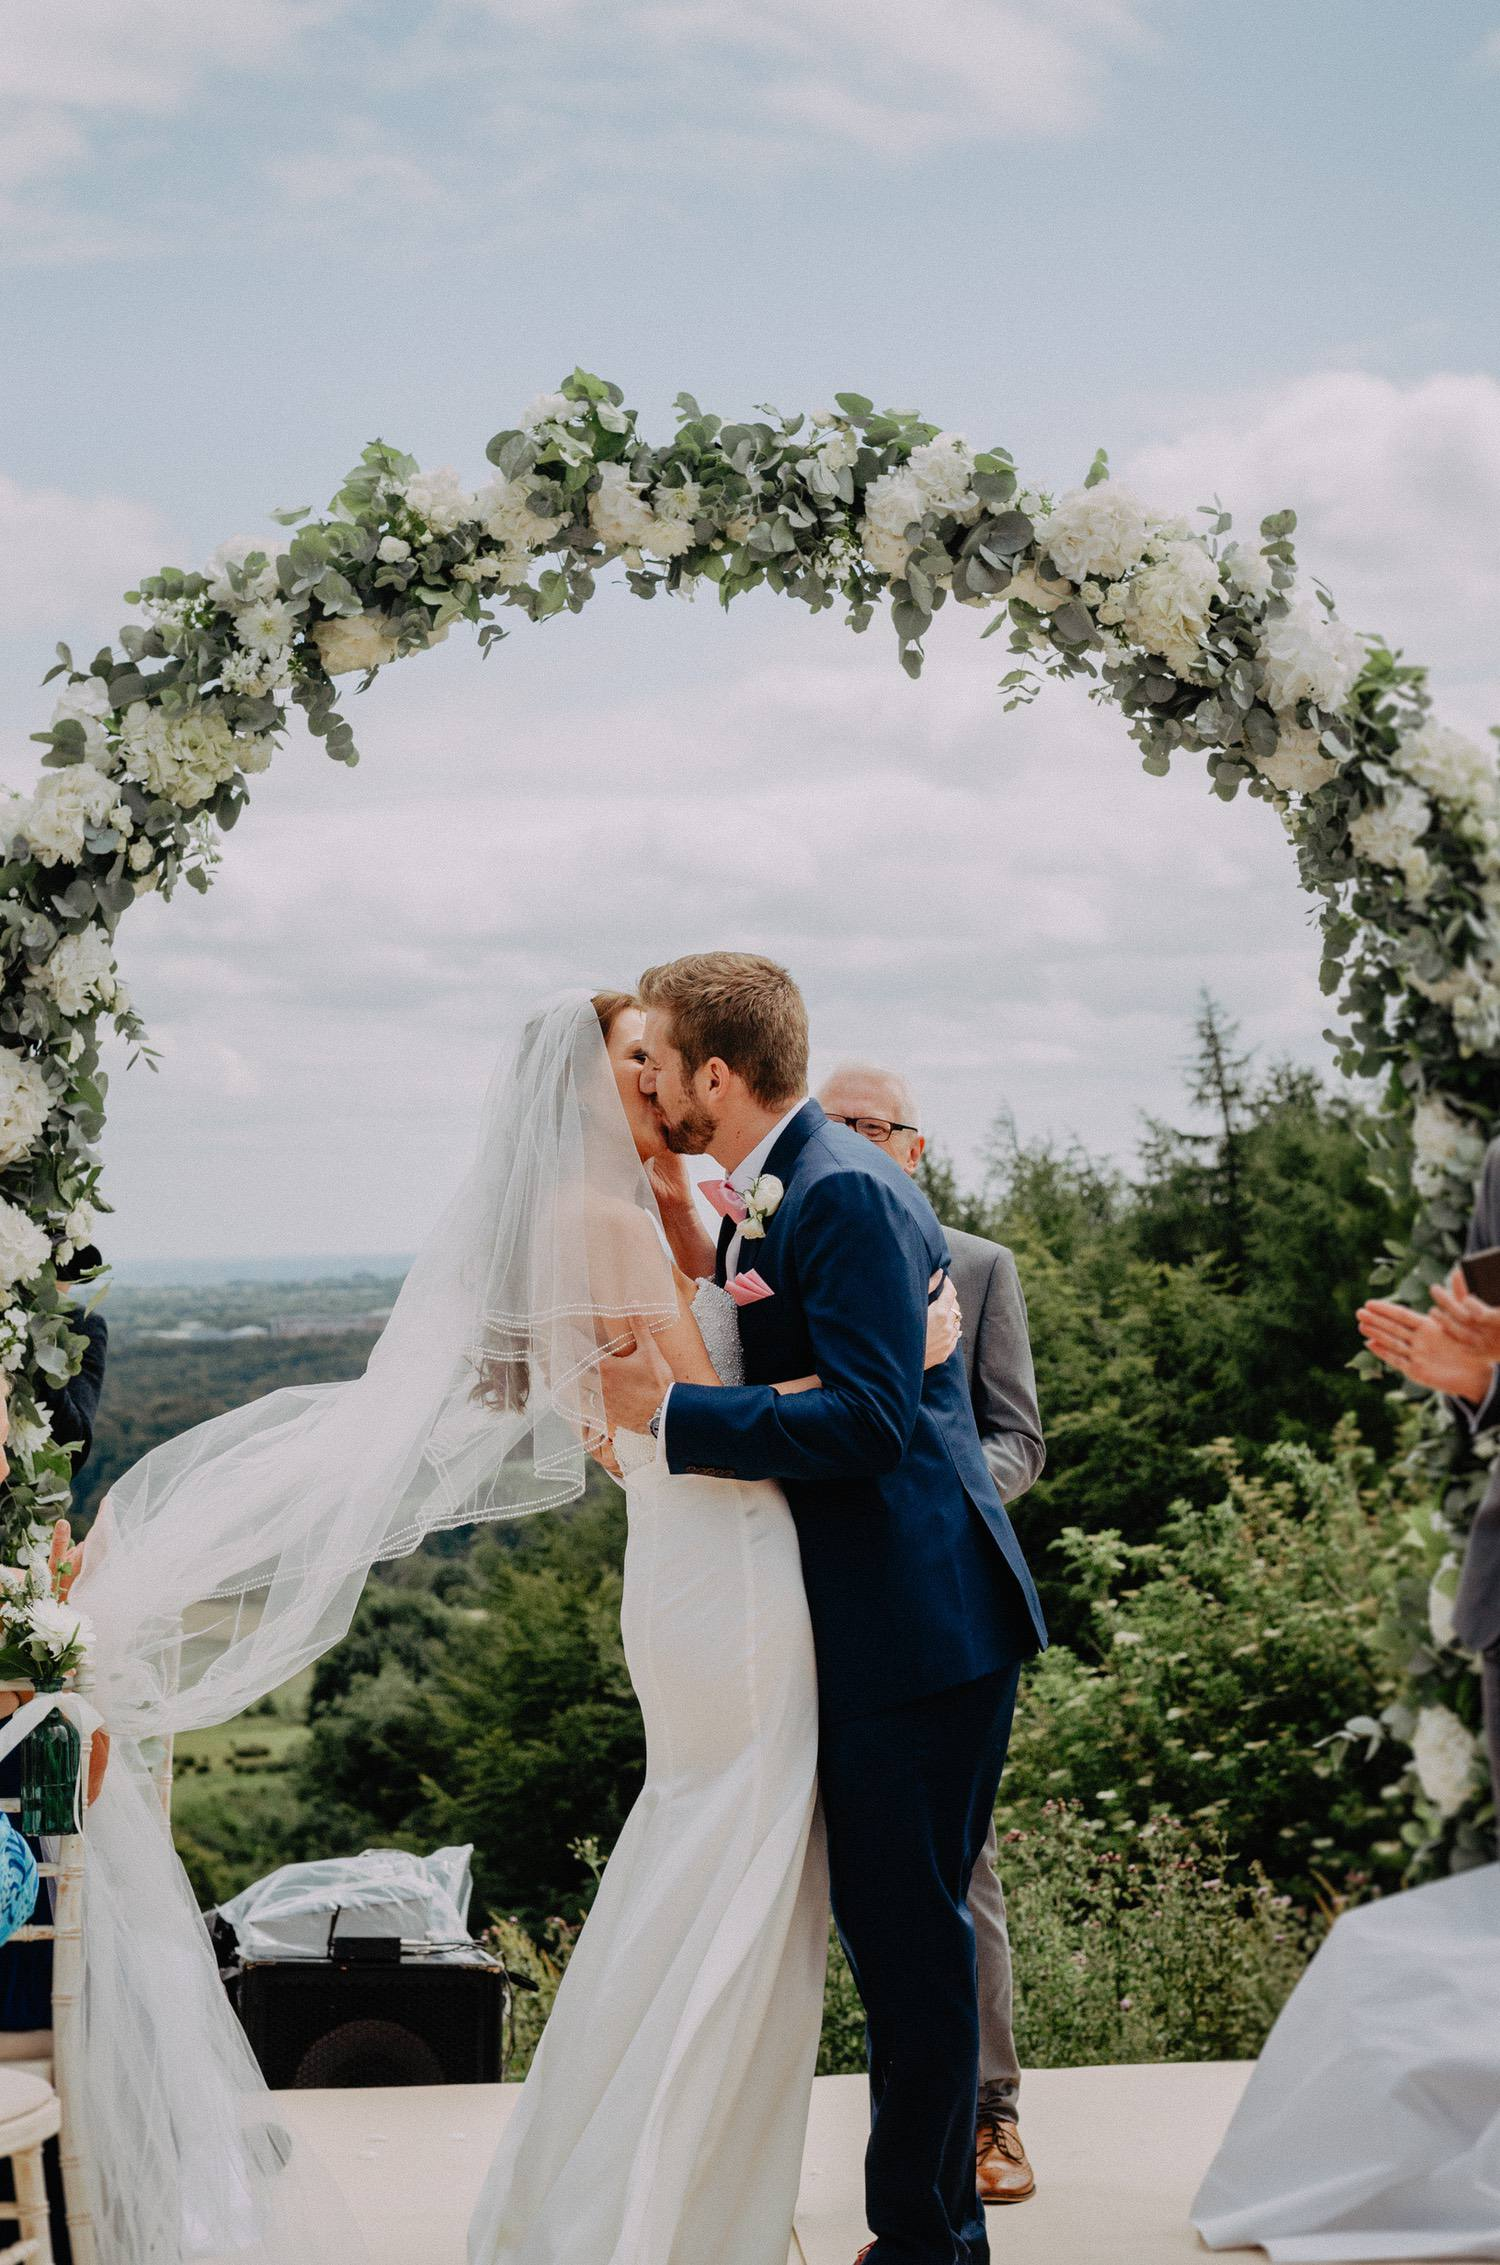 Natural-Retreats-Yorkshire-Wedding-Photographer-37.jpg